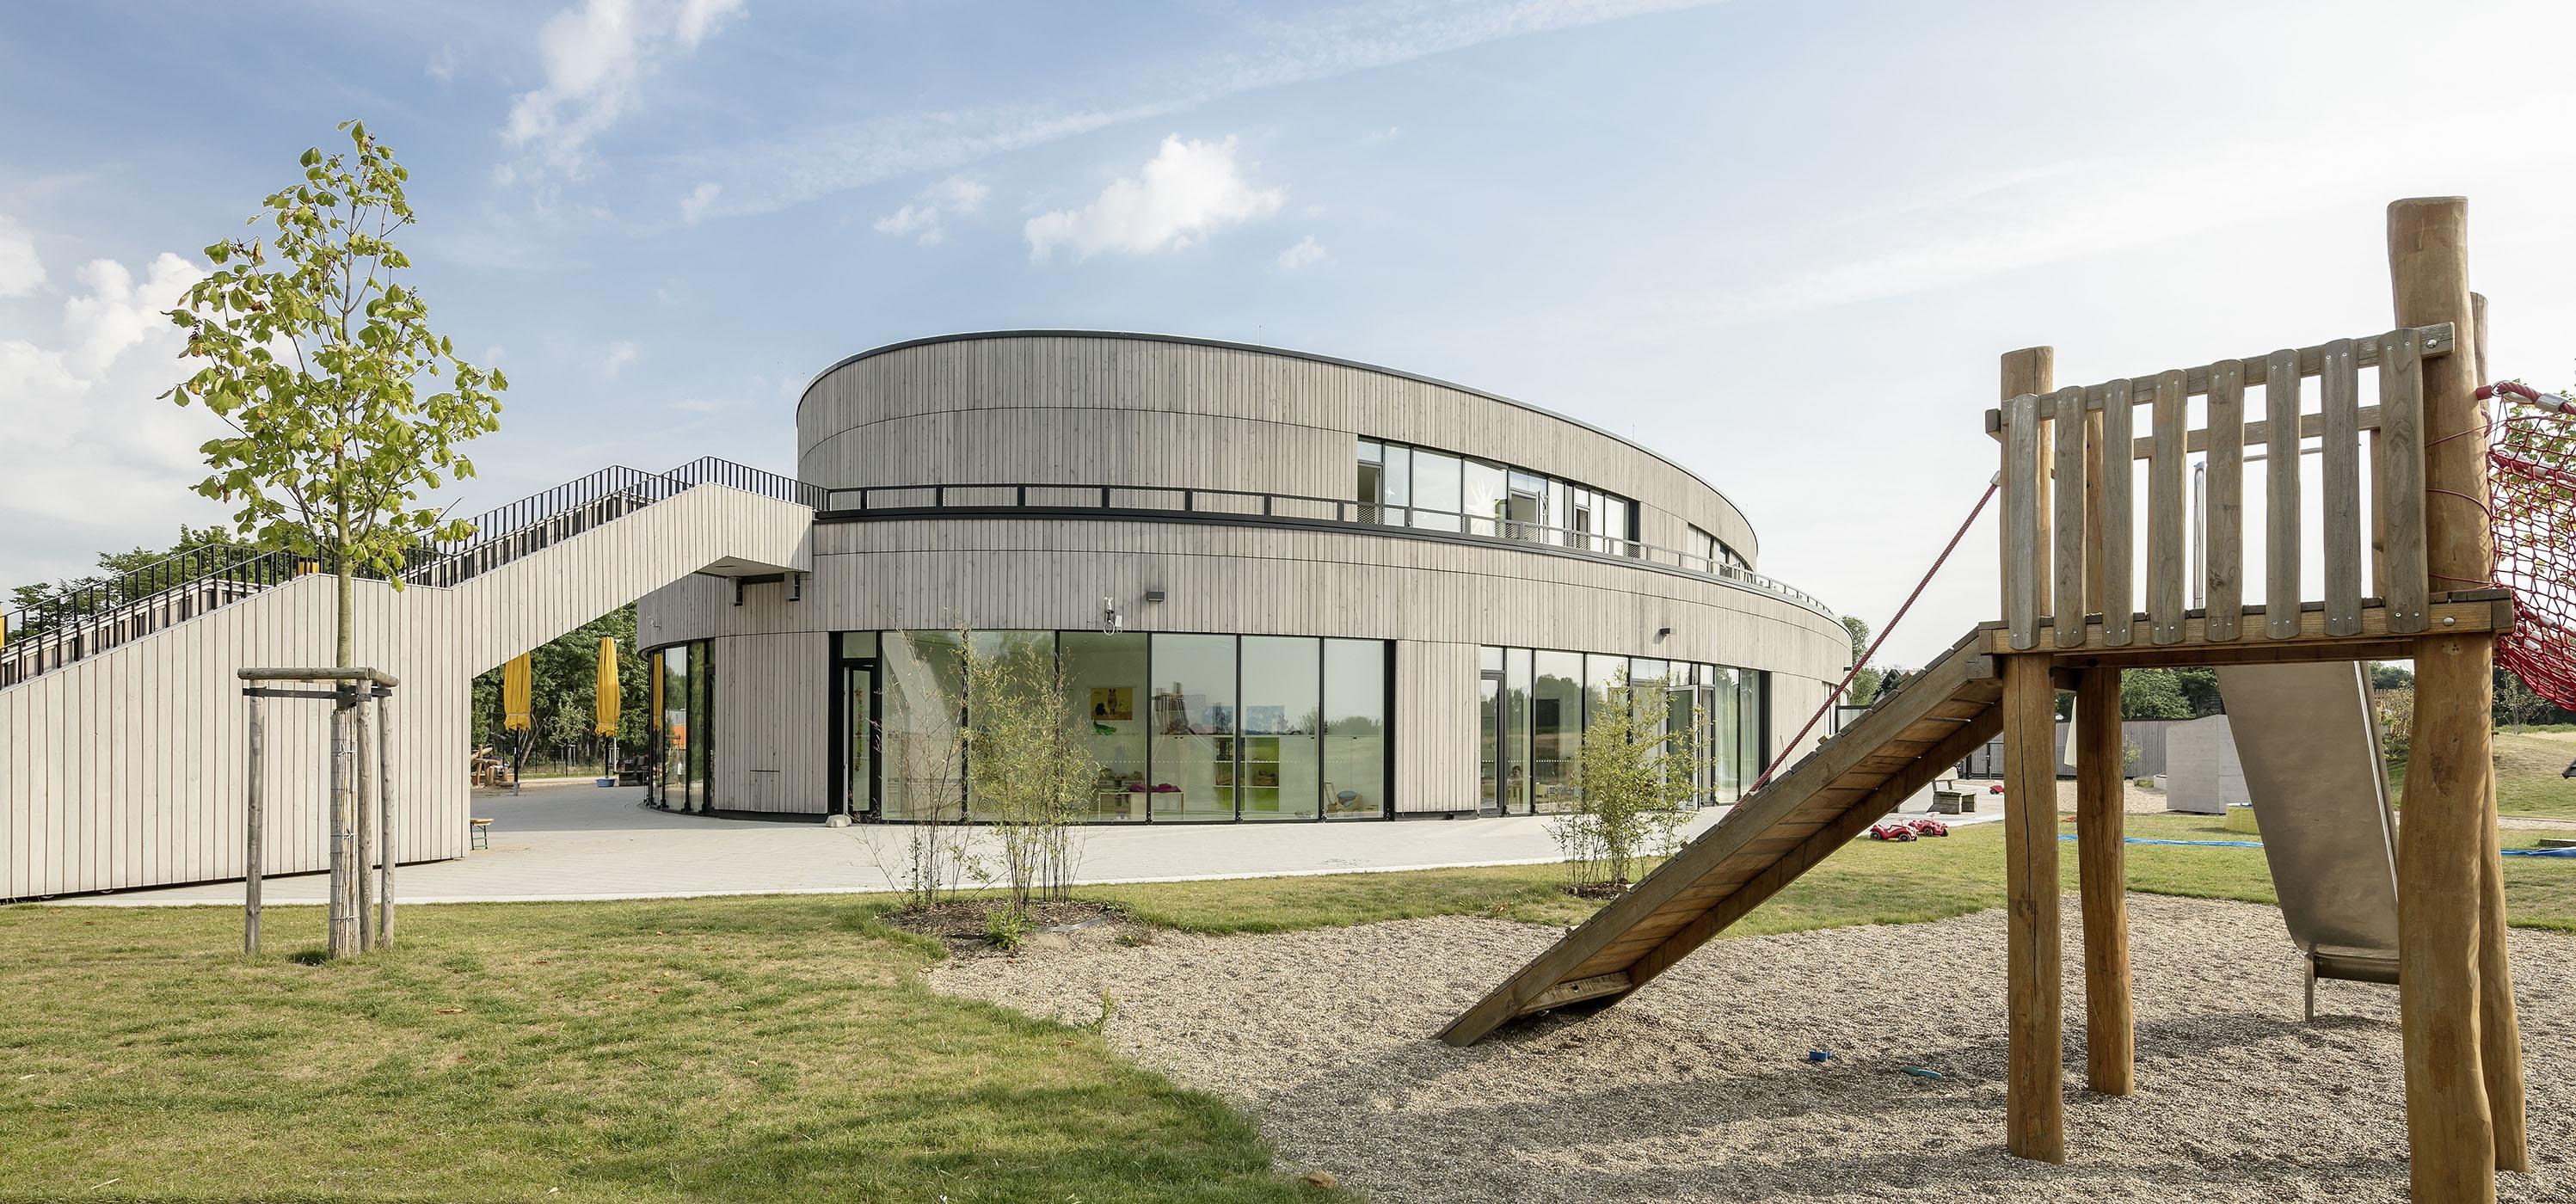 Architekt Leverkusen kinderhort